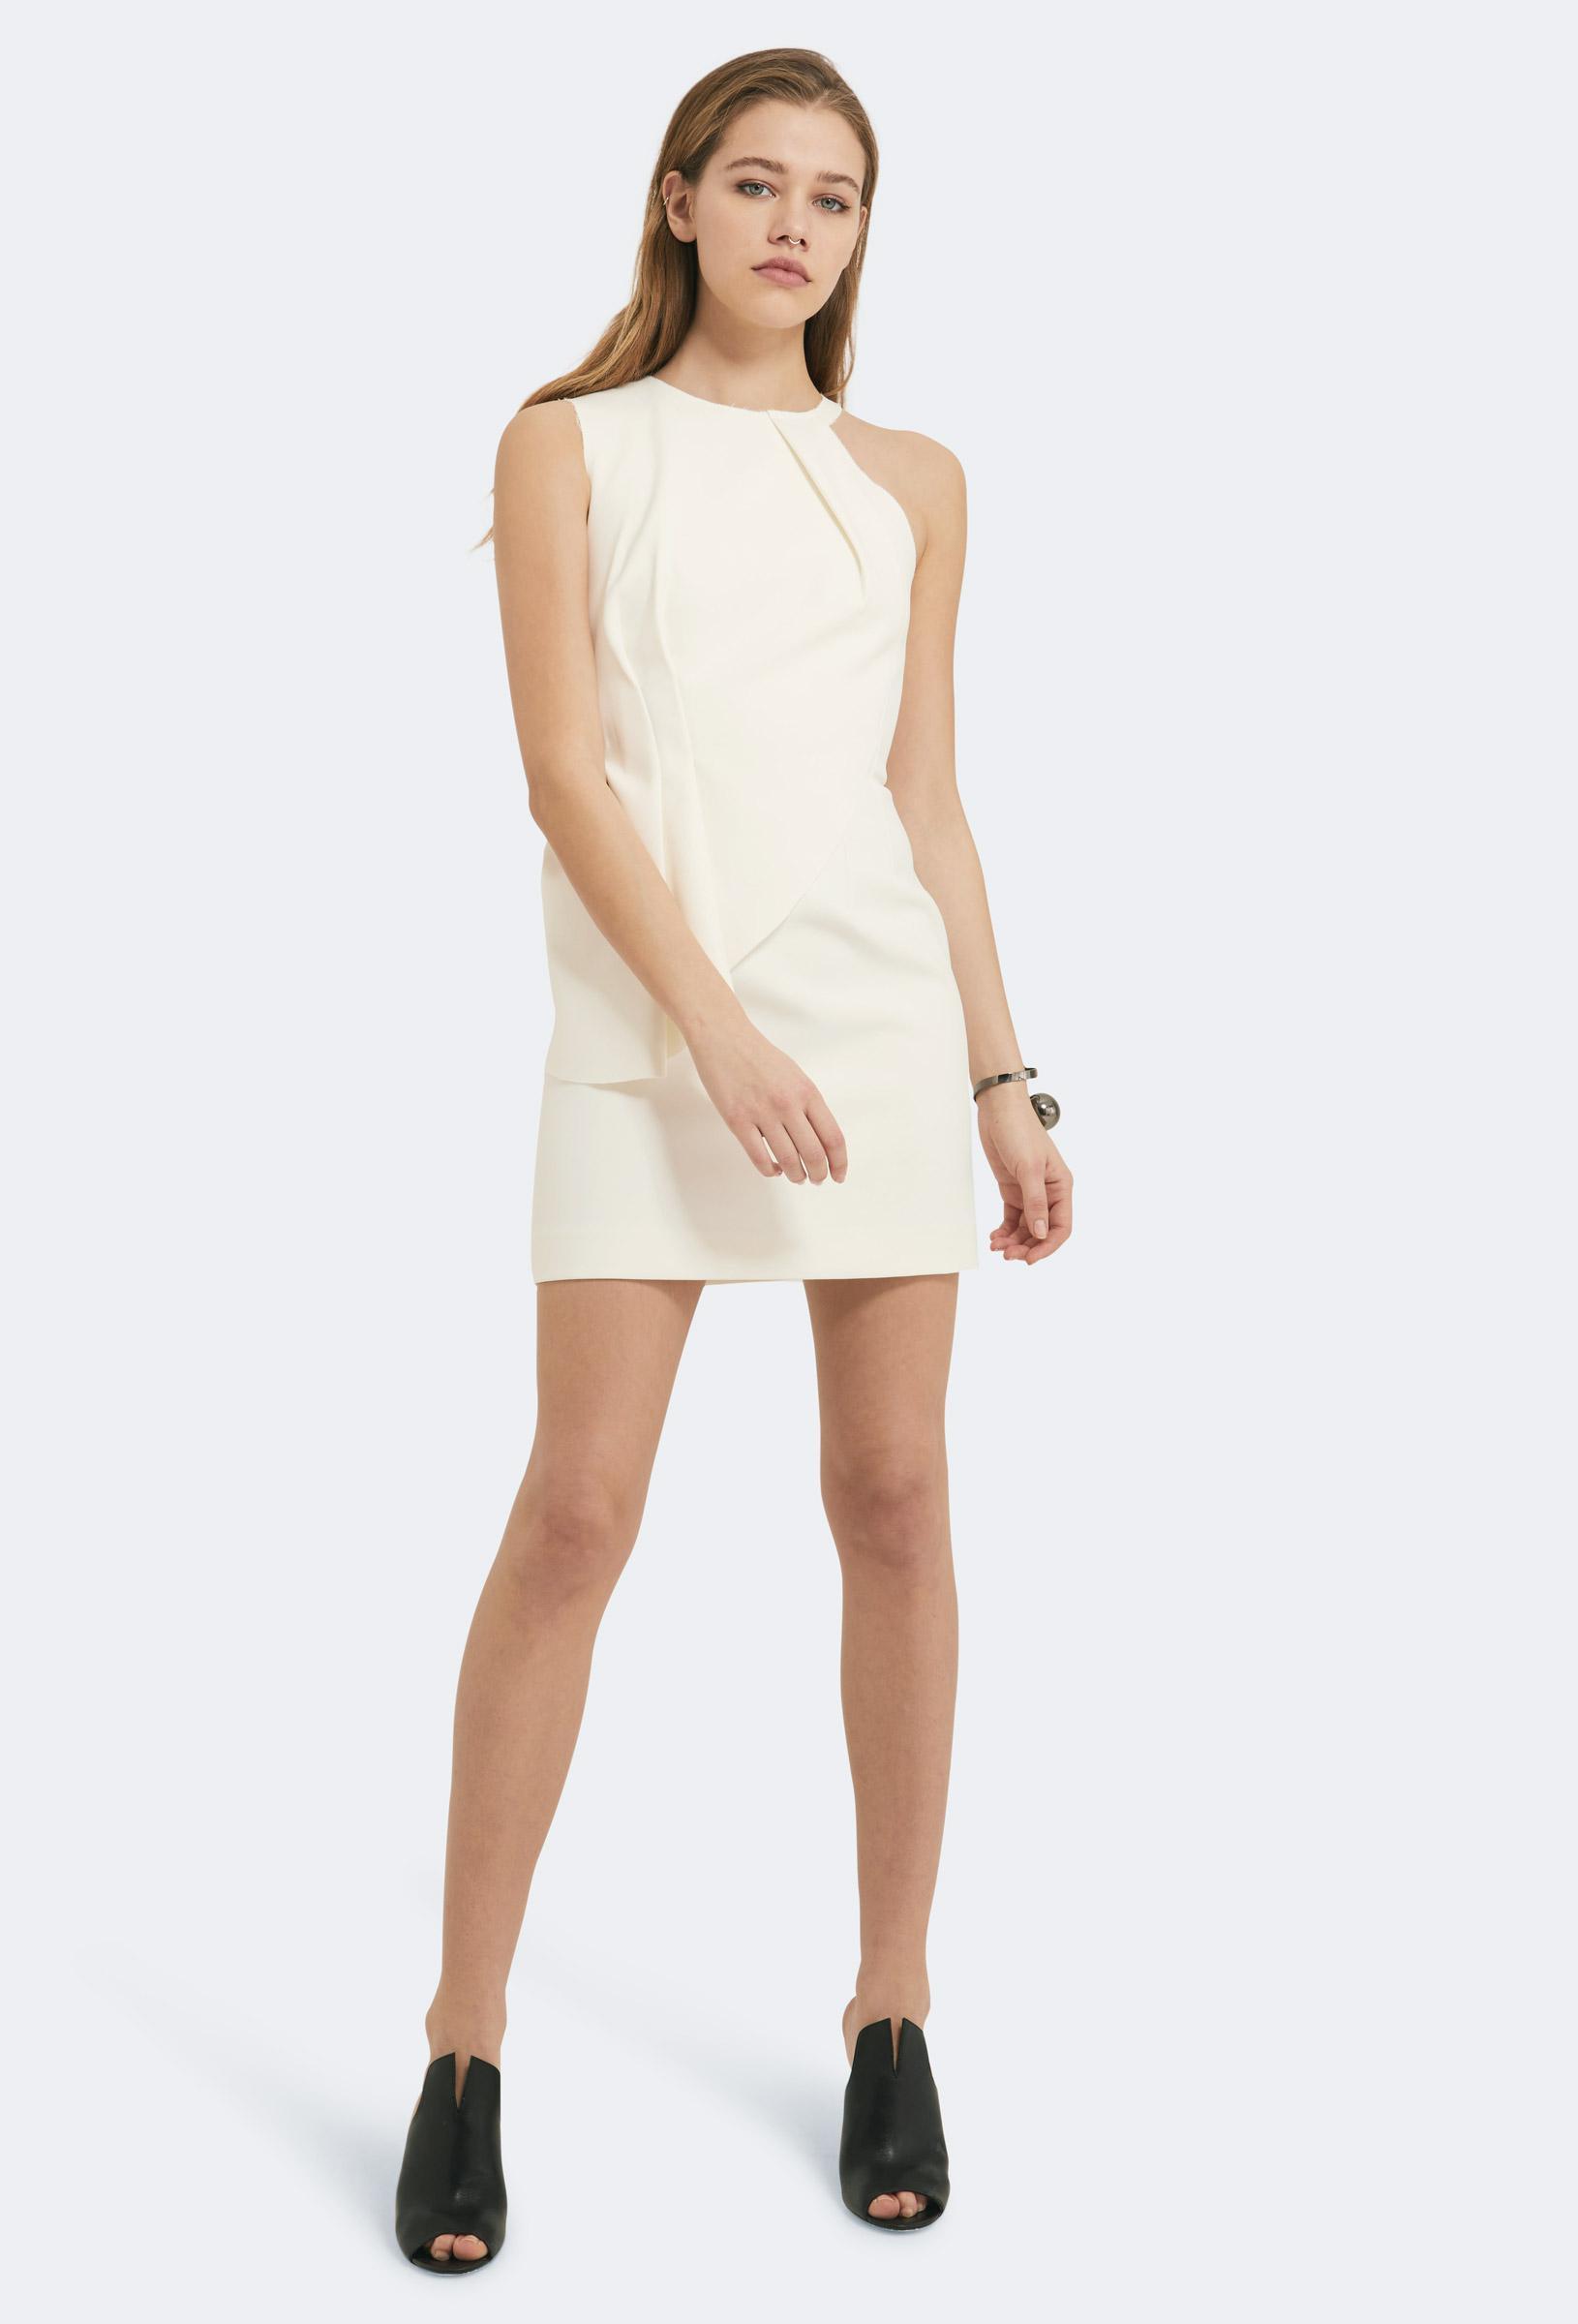 04d7c05a70 AQ/AQ Quinto Peplum Mini Dress Cream White in White - Lyst